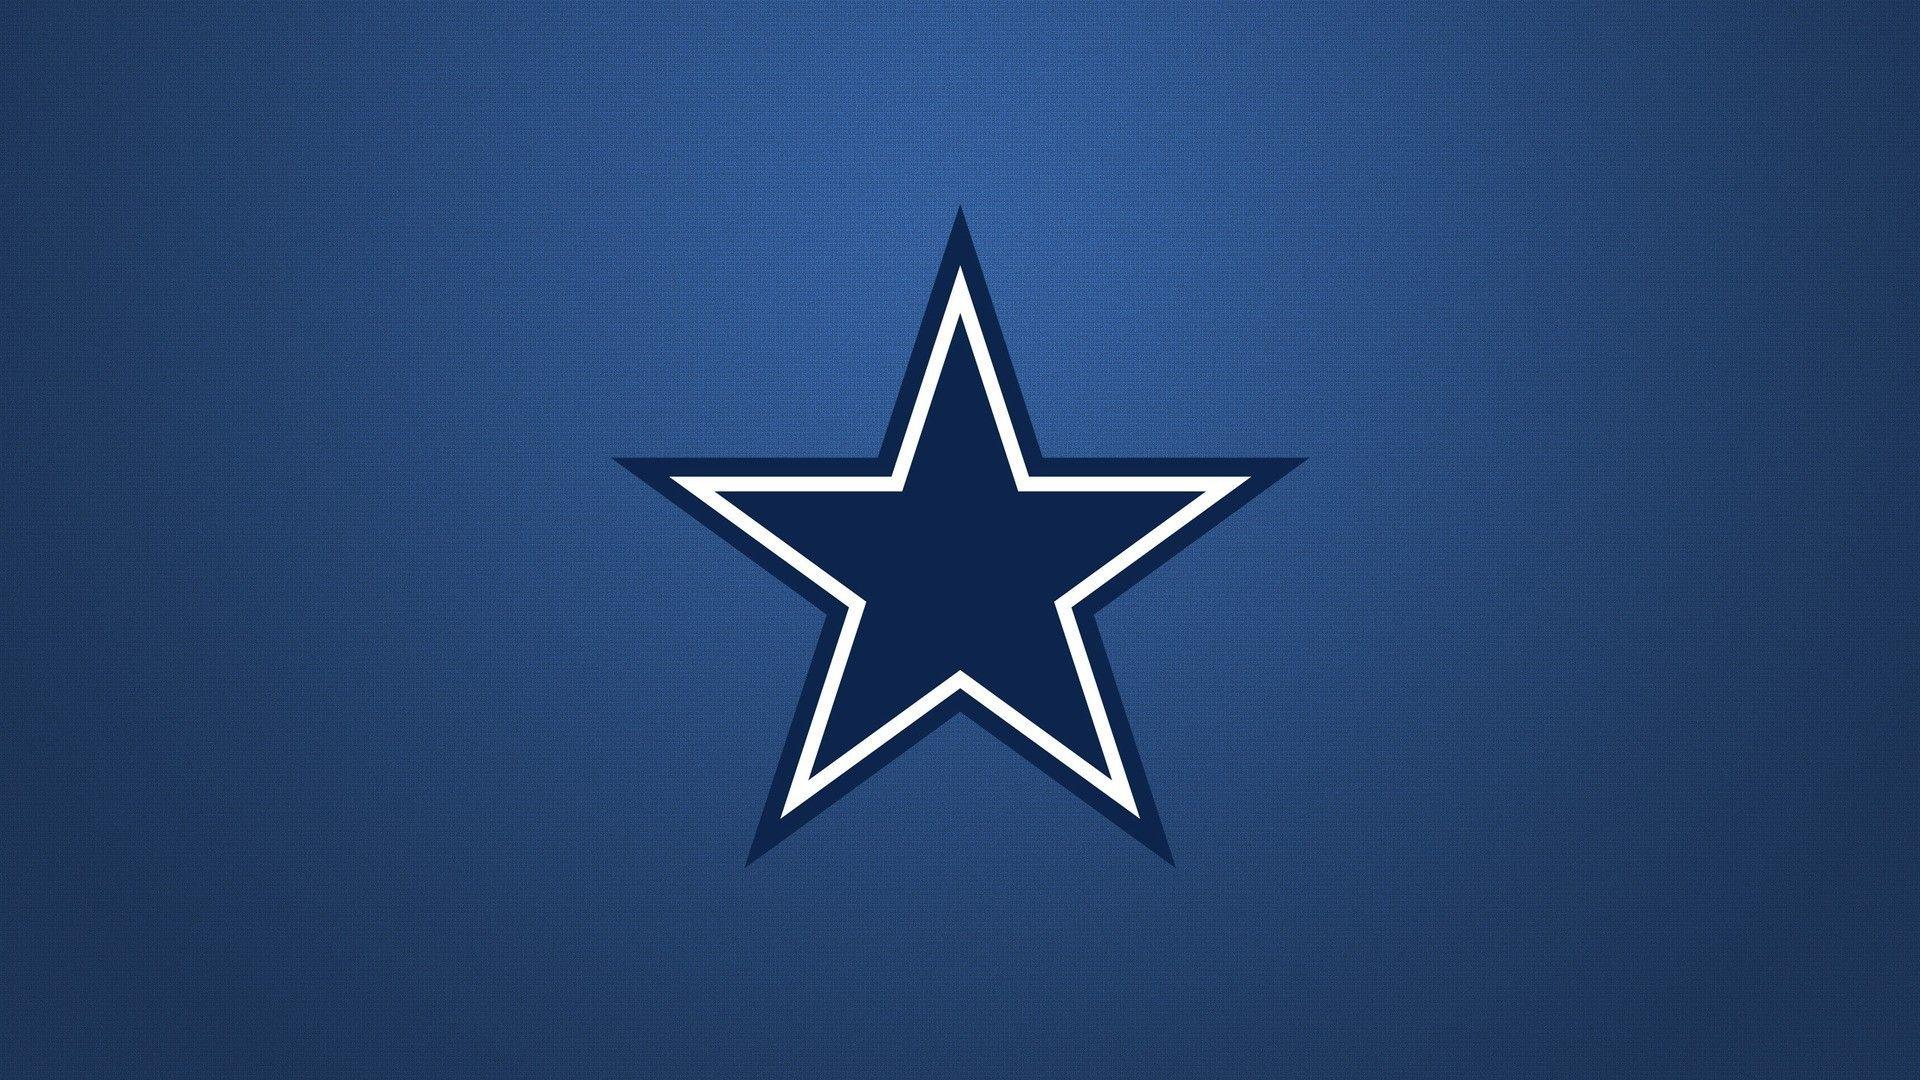 Backgrounds Dallas Cowboys Hd 2020 Nfl Football Wallpapers Dallas Cowboys Wallpaper Dallas Cowboys Football Wallpaper